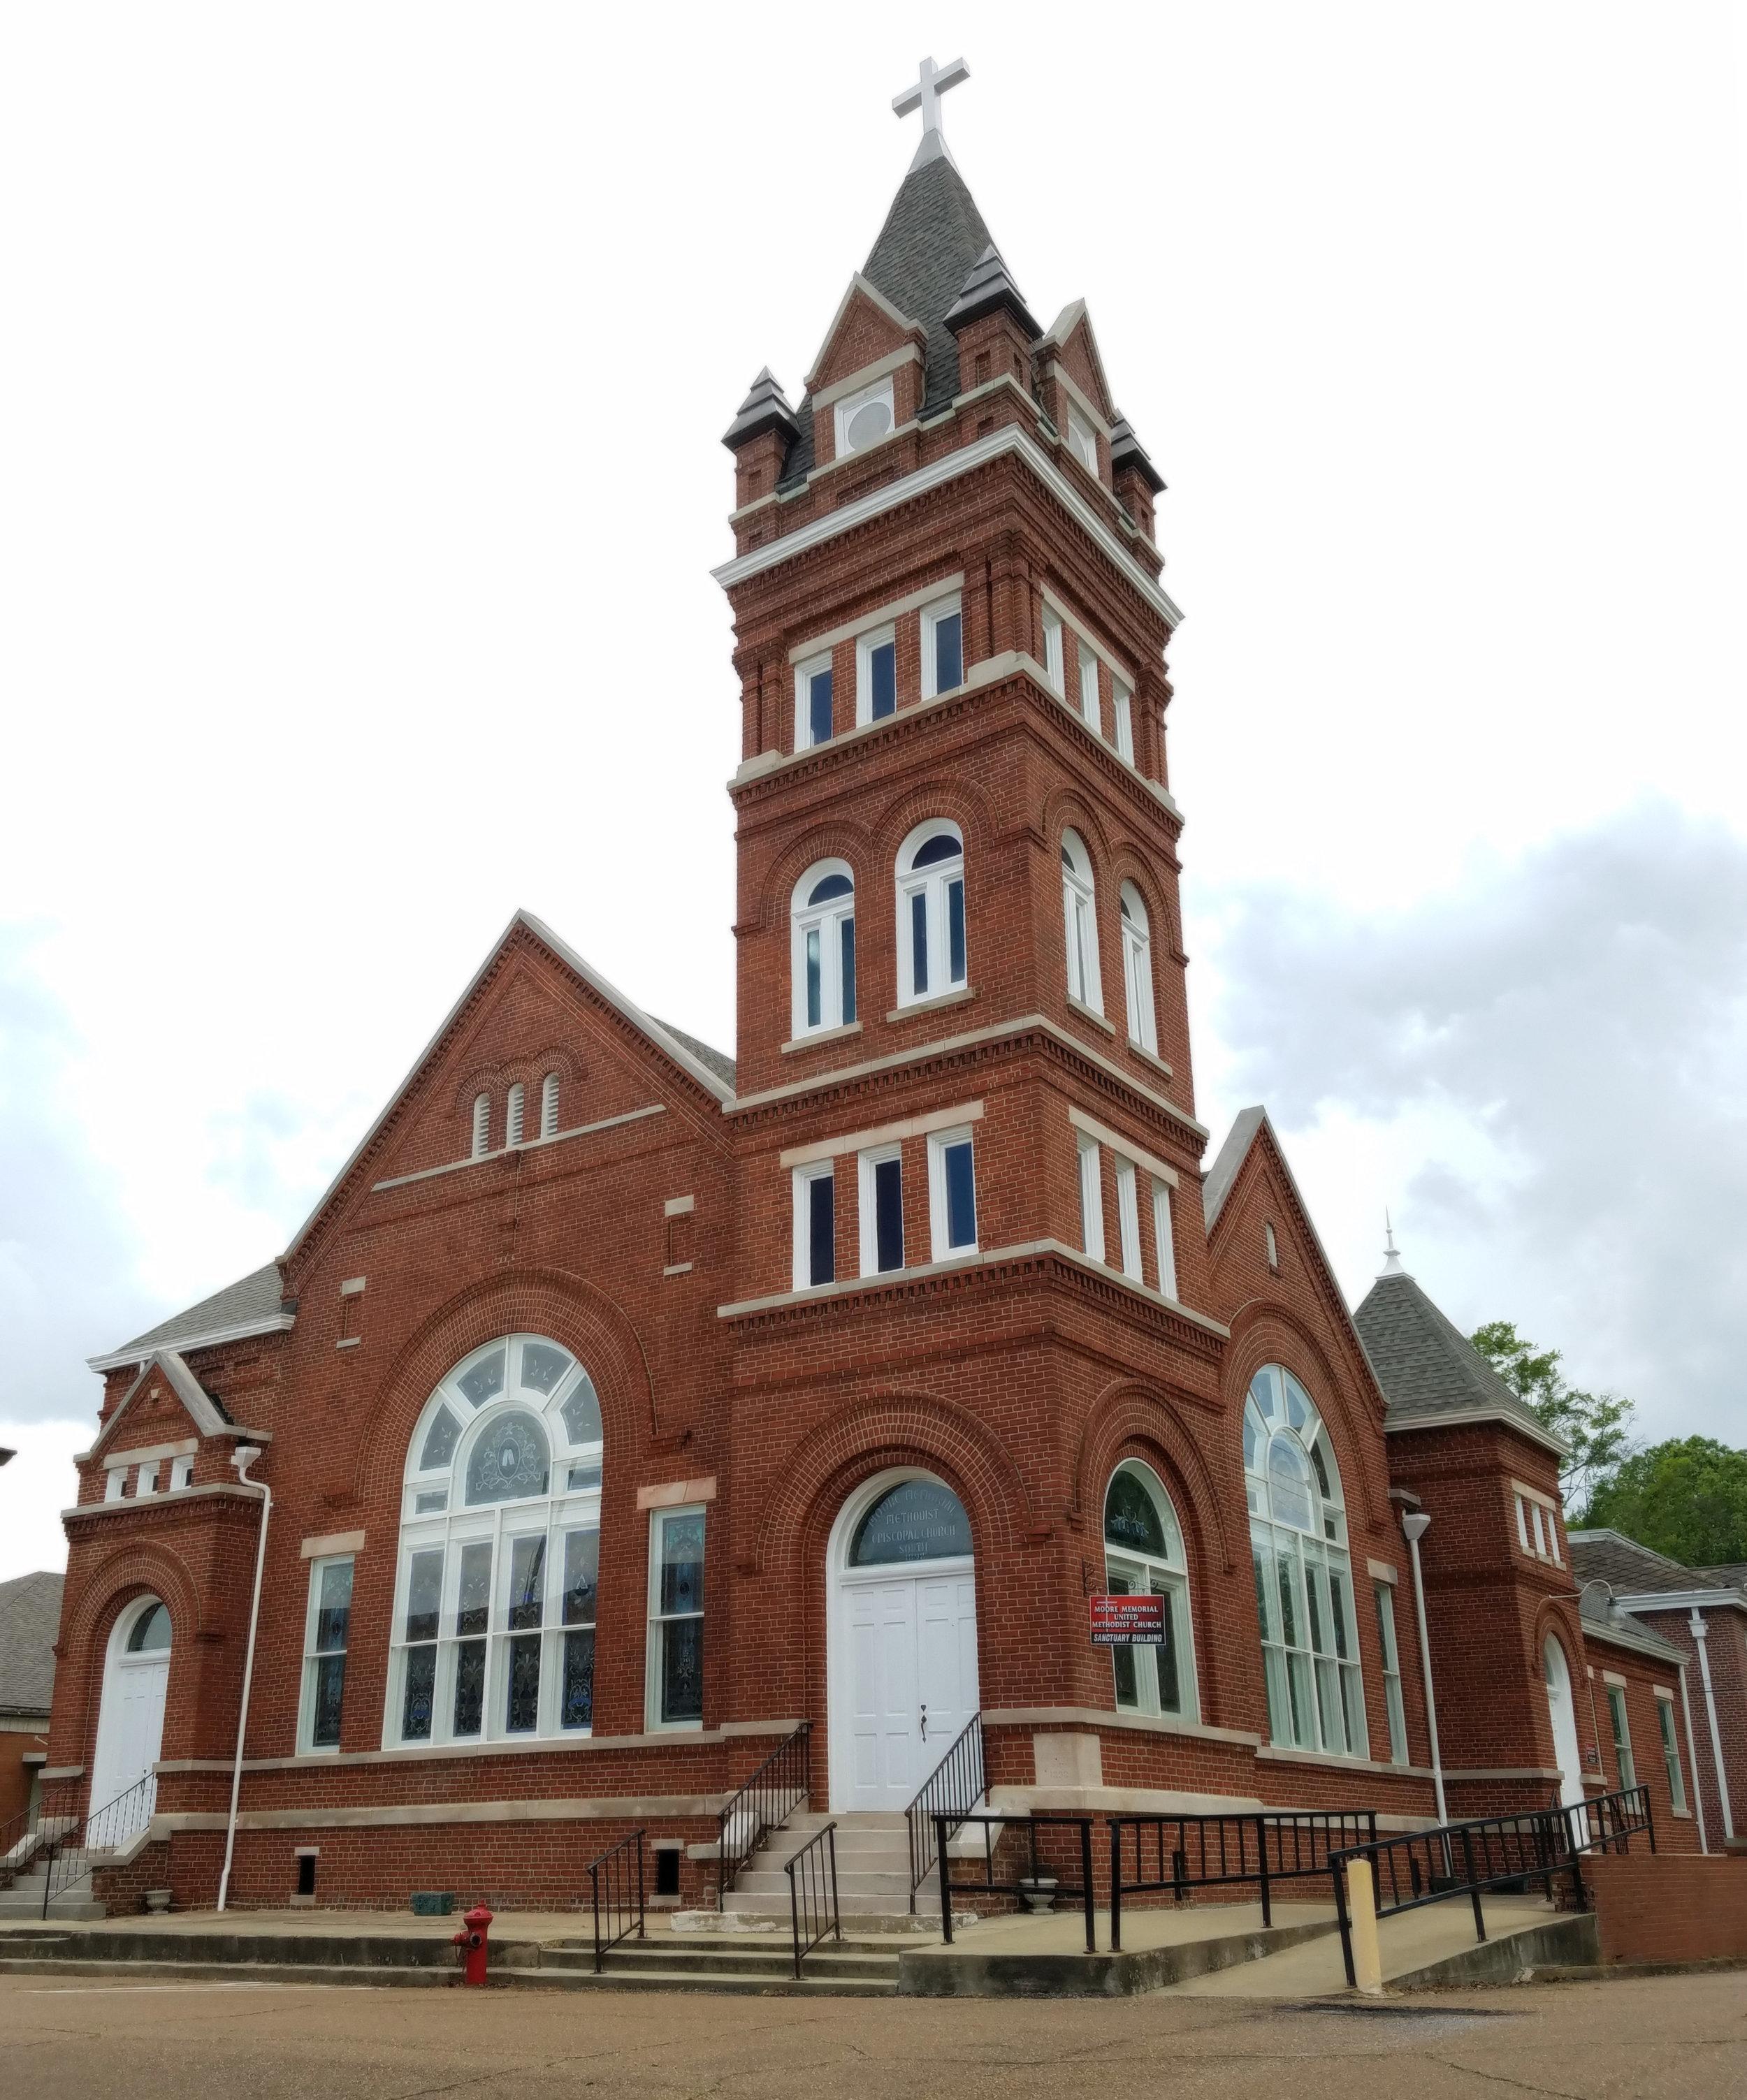 Moore Memorial United Methodist Church, Winona, Miss., 1898